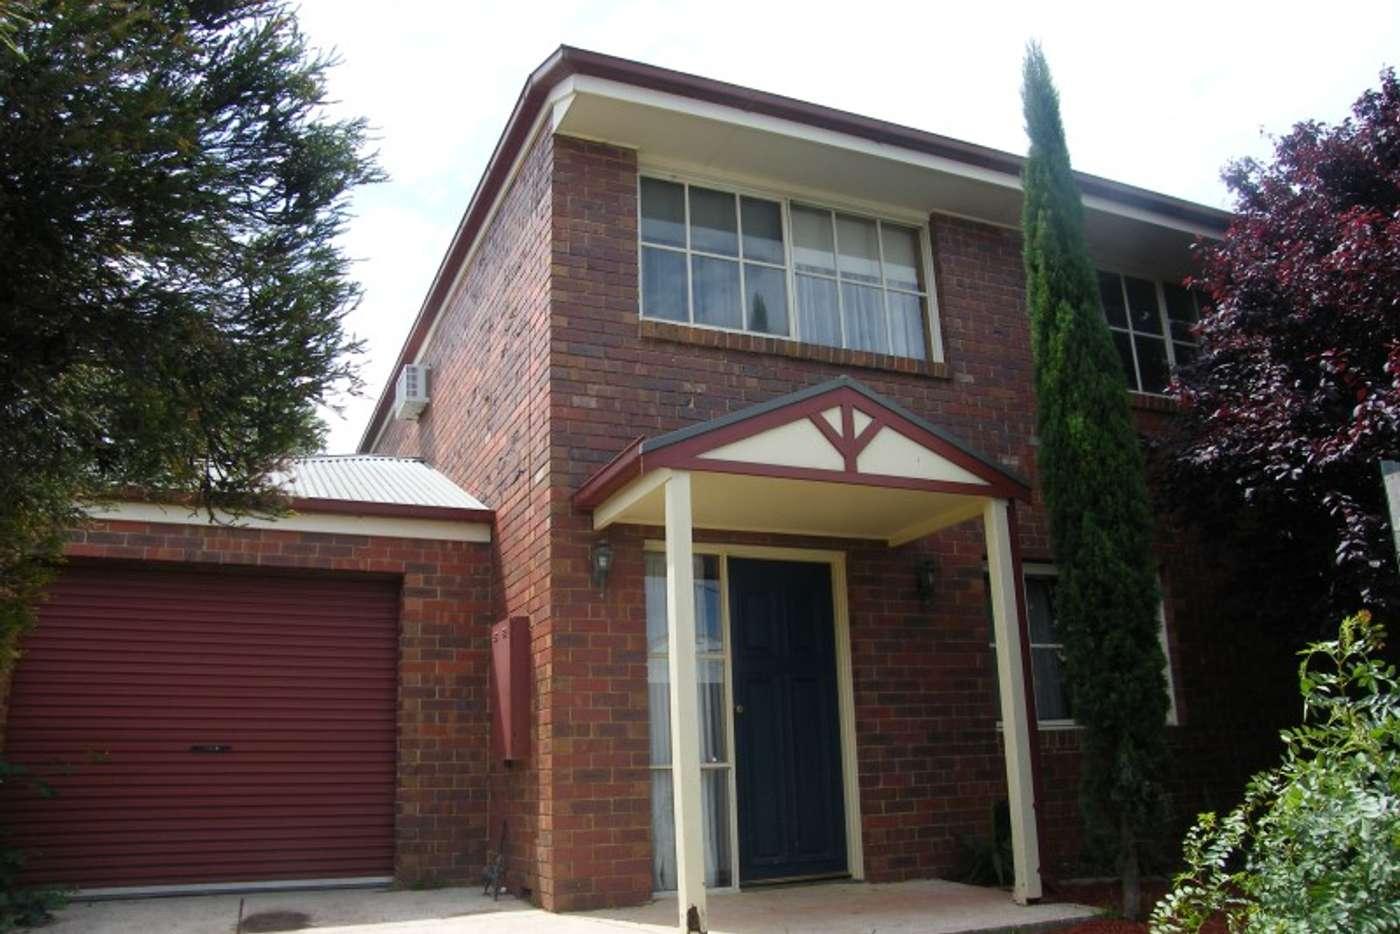 Main view of Homely townhouse listing, 42B Vineyard Road, Sunbury VIC 3429